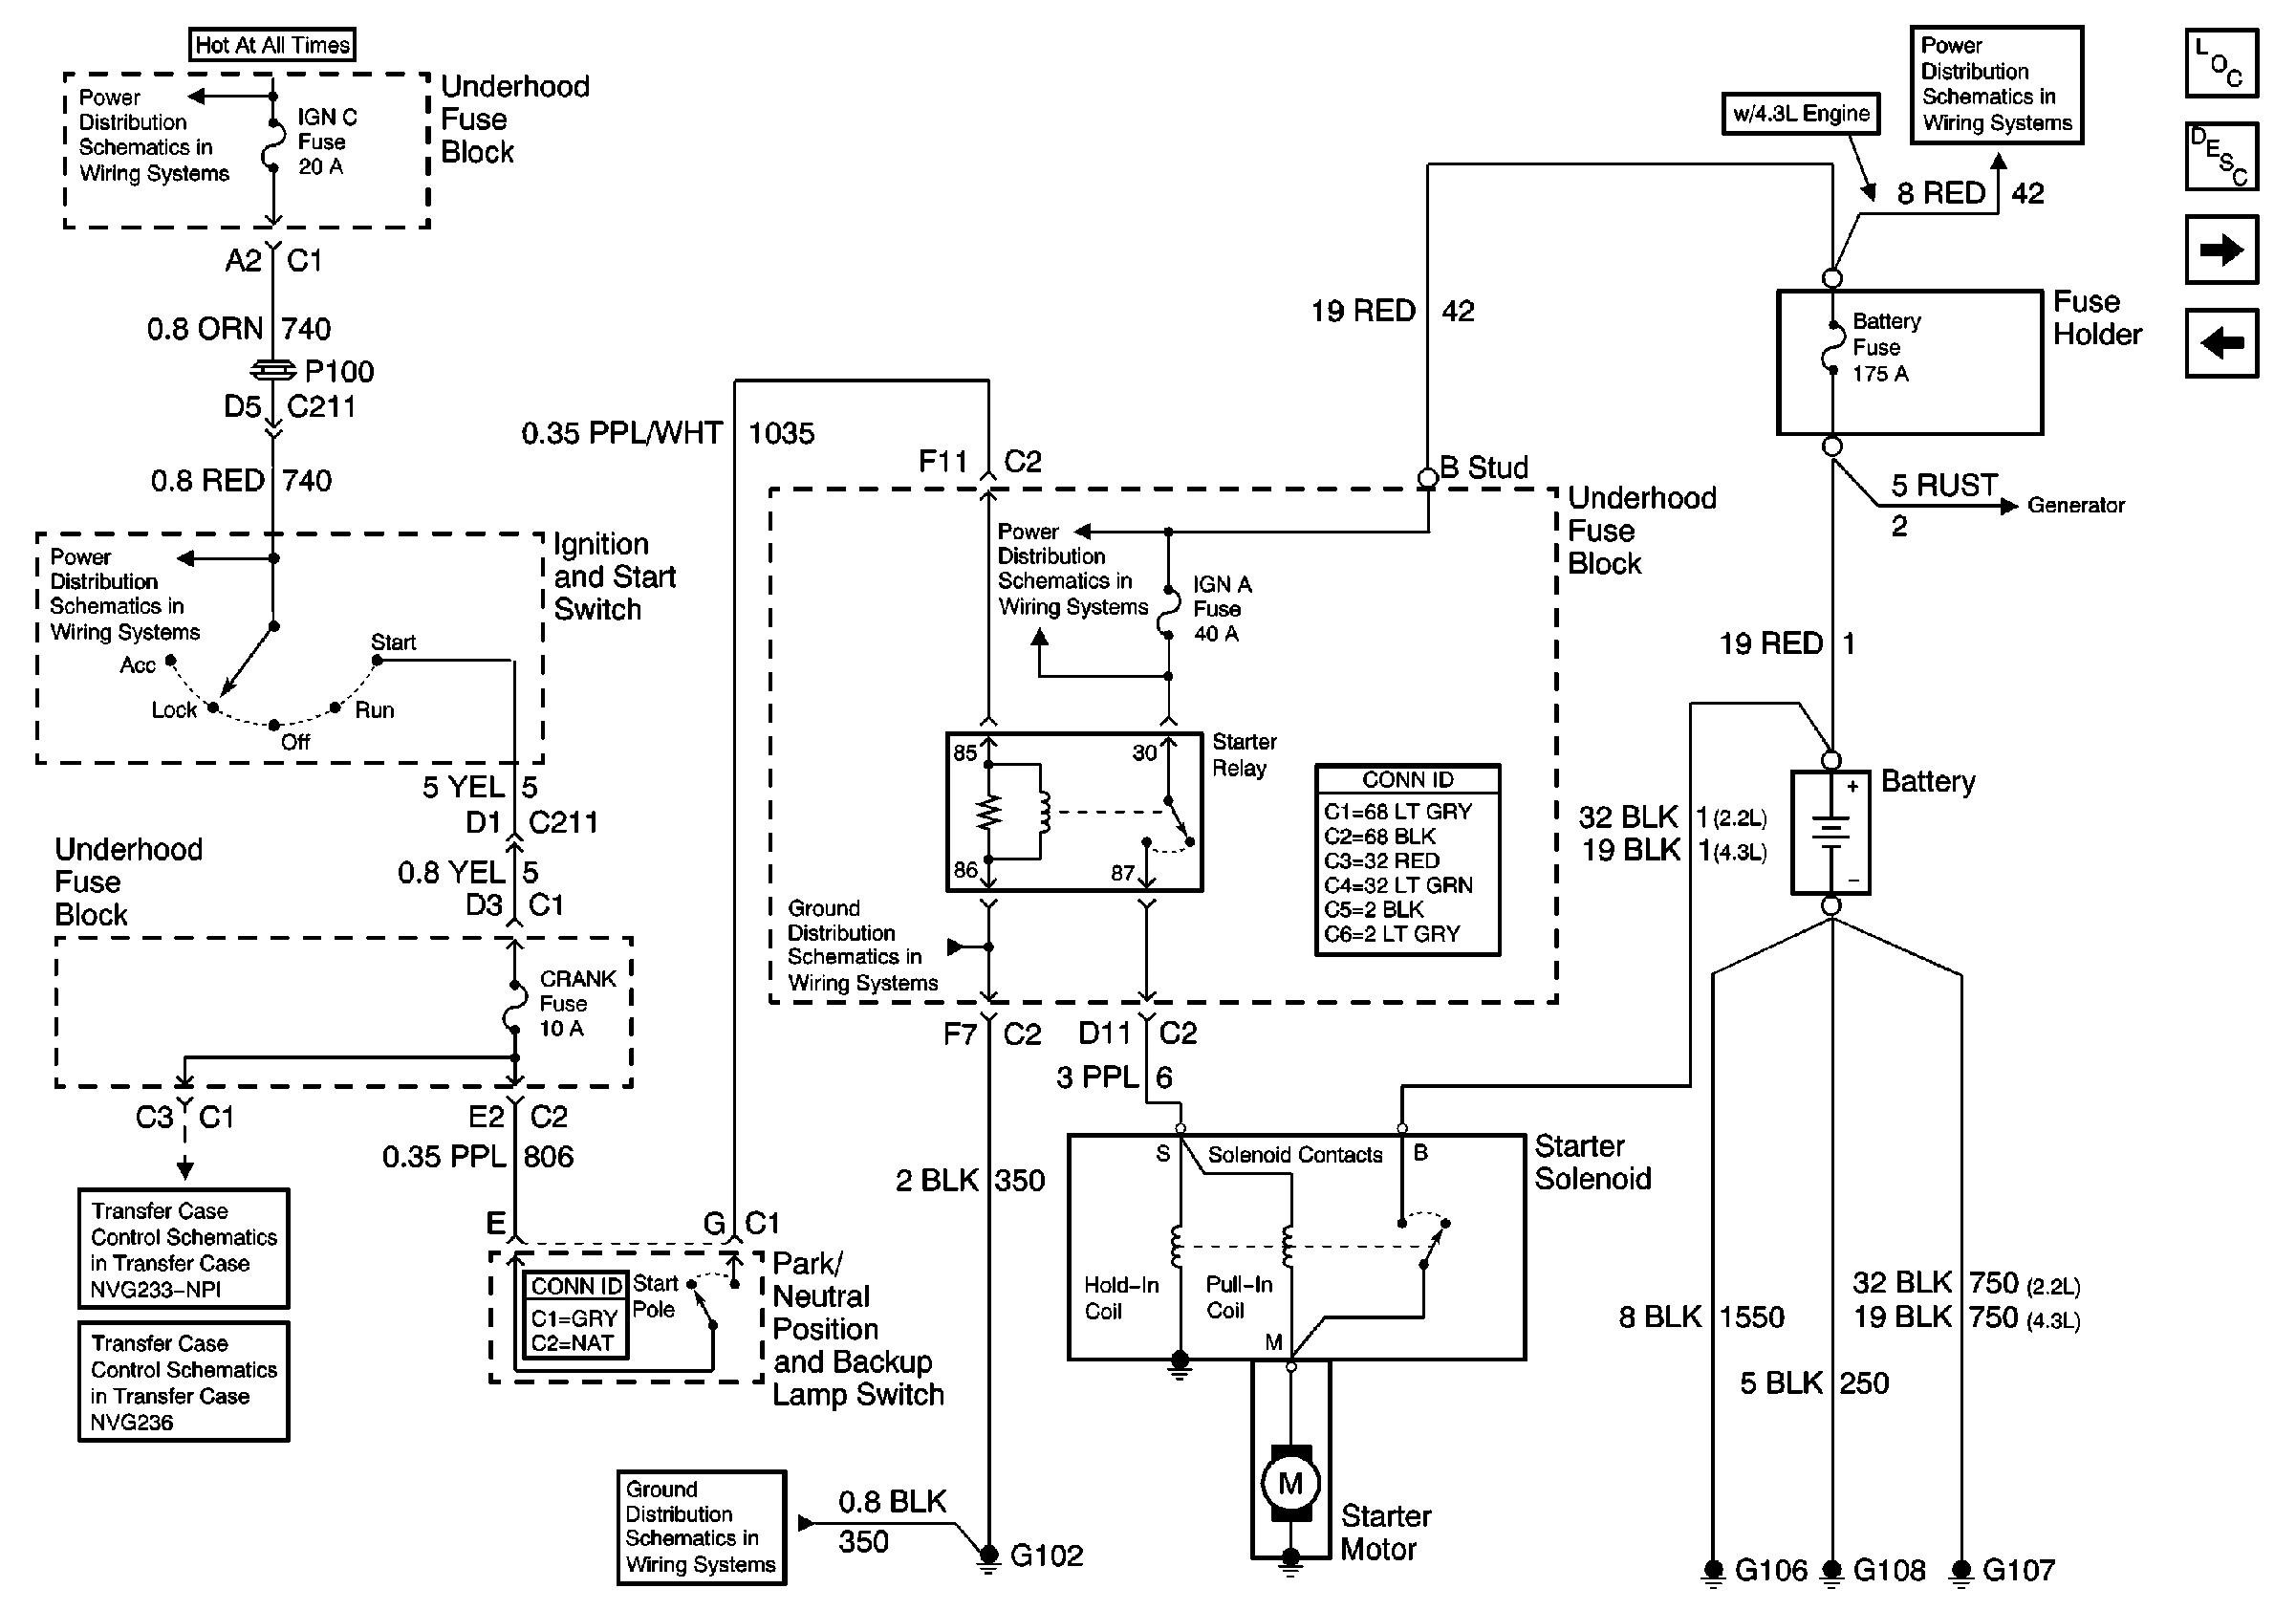 Chrysler Crossfire Engine Diagram 1aff3 Chevy Tbi Injector Wiring Diagram Of Chrysler Crossfire Engine Diagram